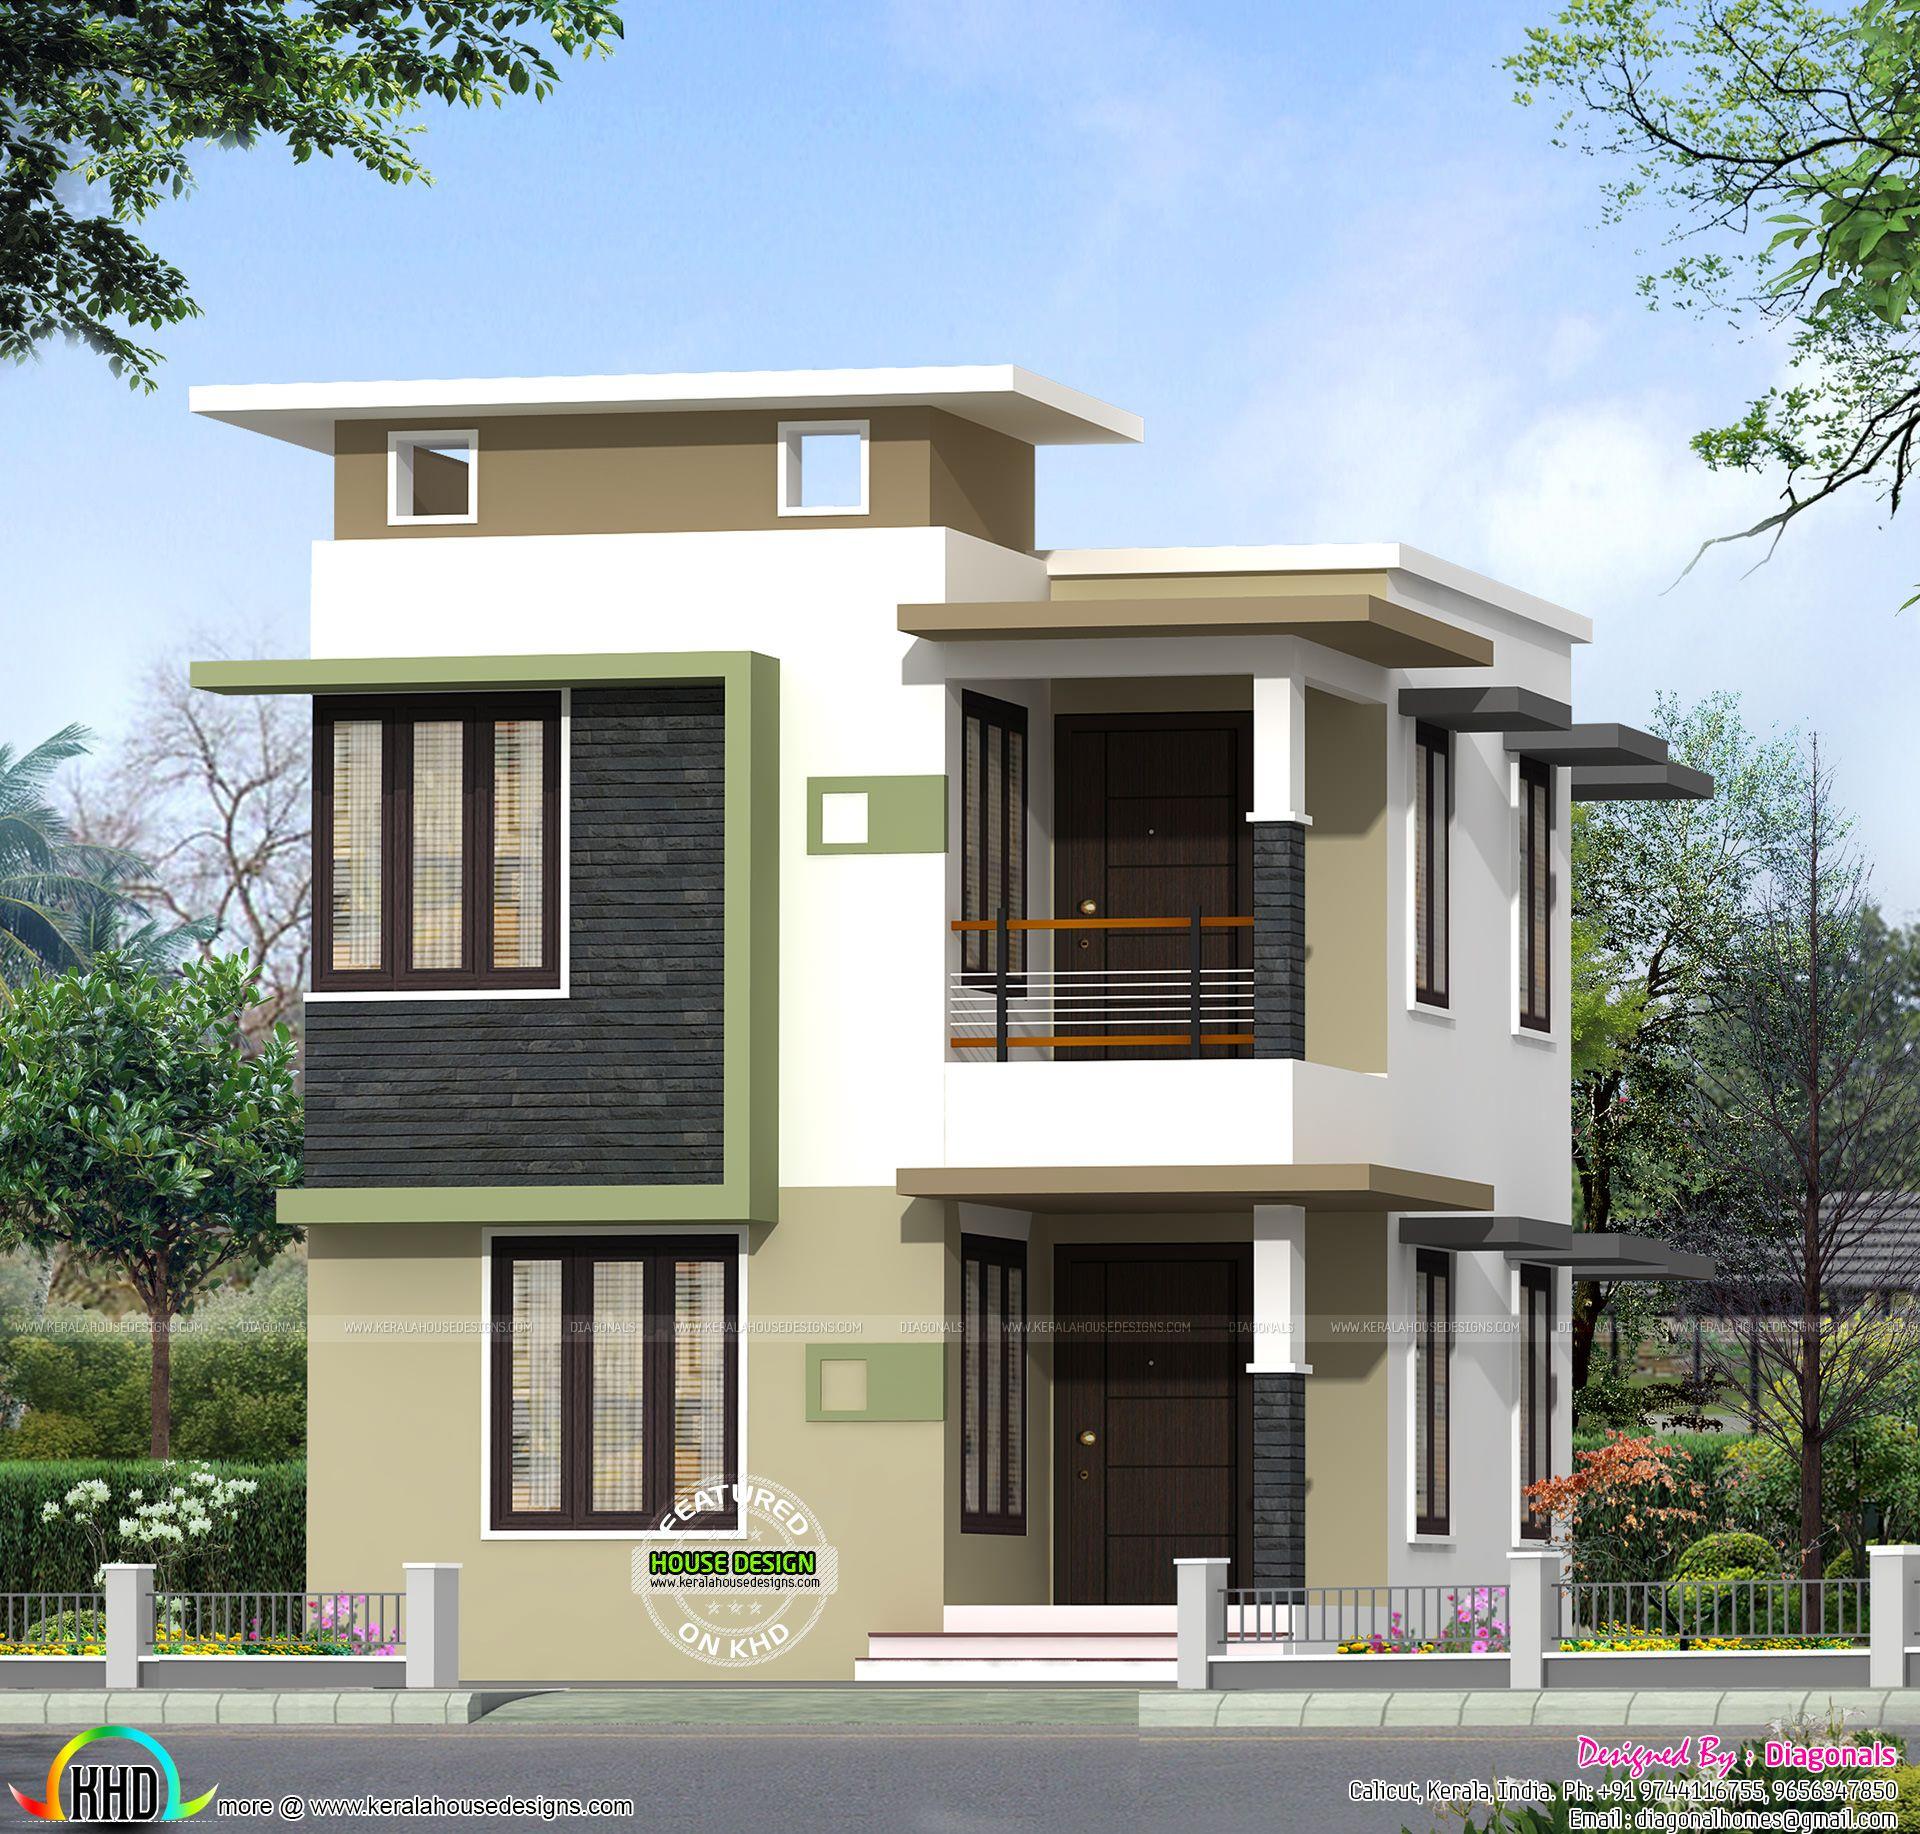 duplex house plans for 700 sq ft | Житло індивідуальне | Pinterest ...